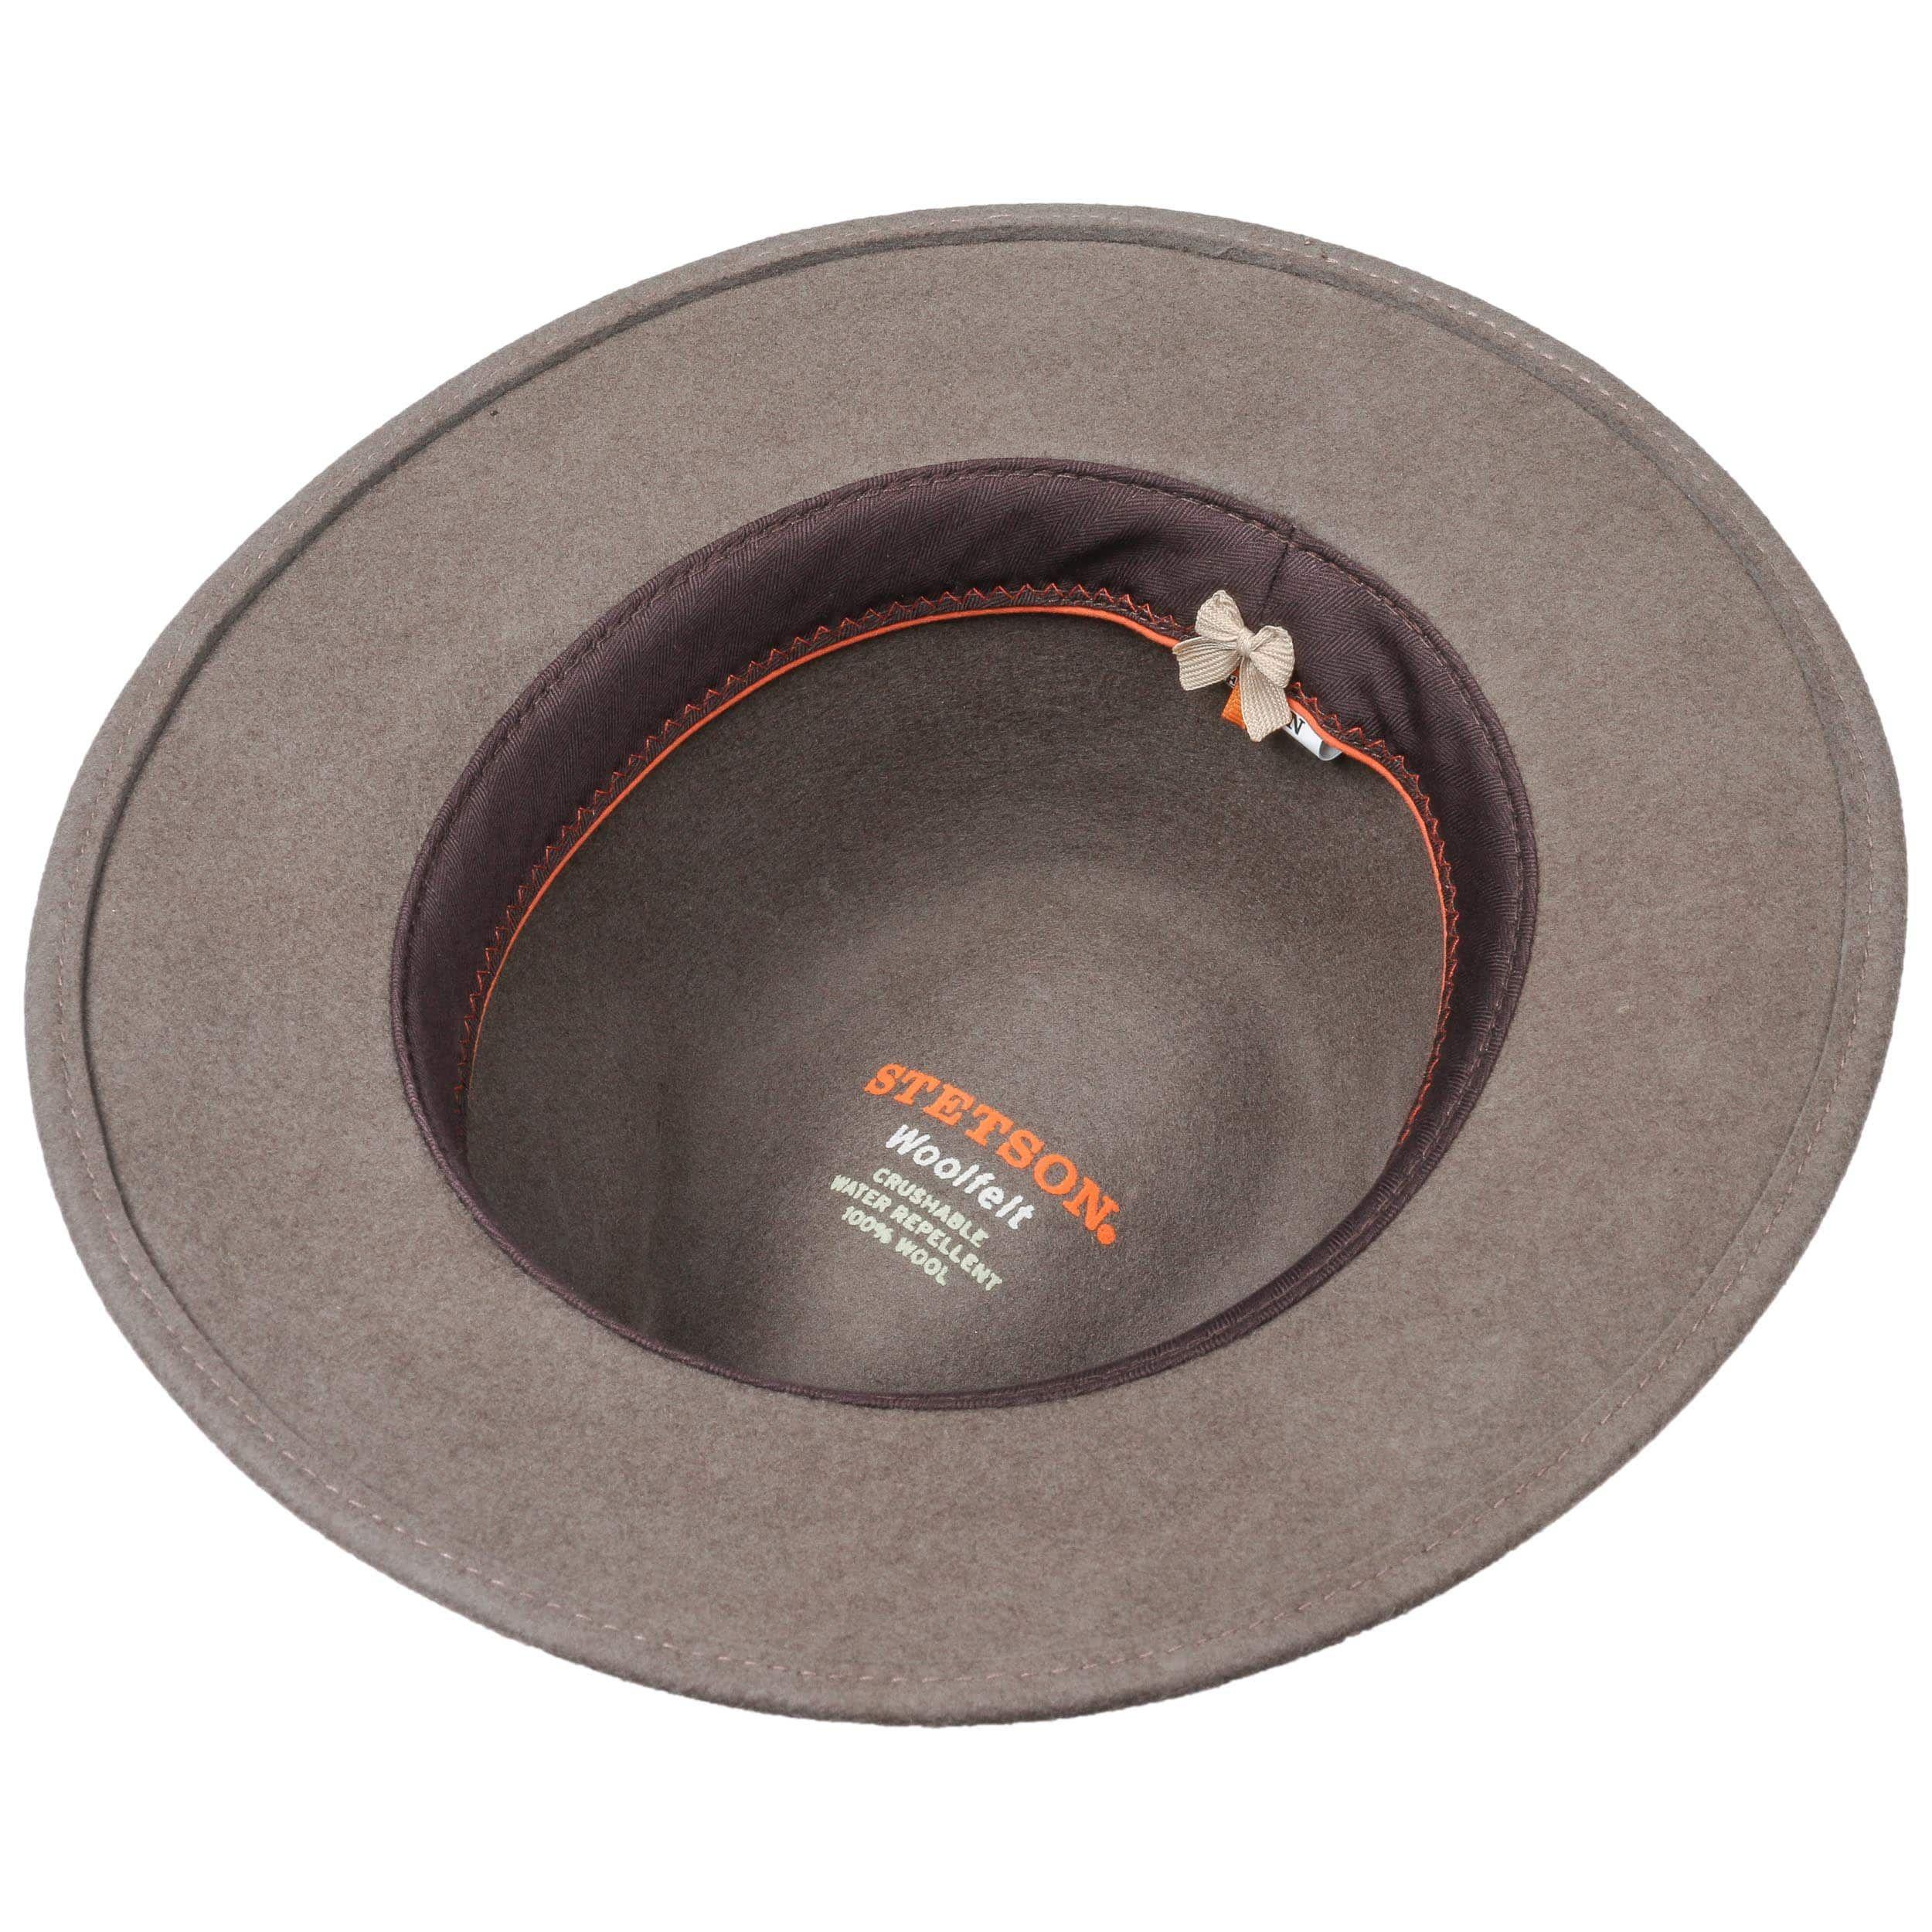 Parlesto Traveller Wool Felt Hat taupe